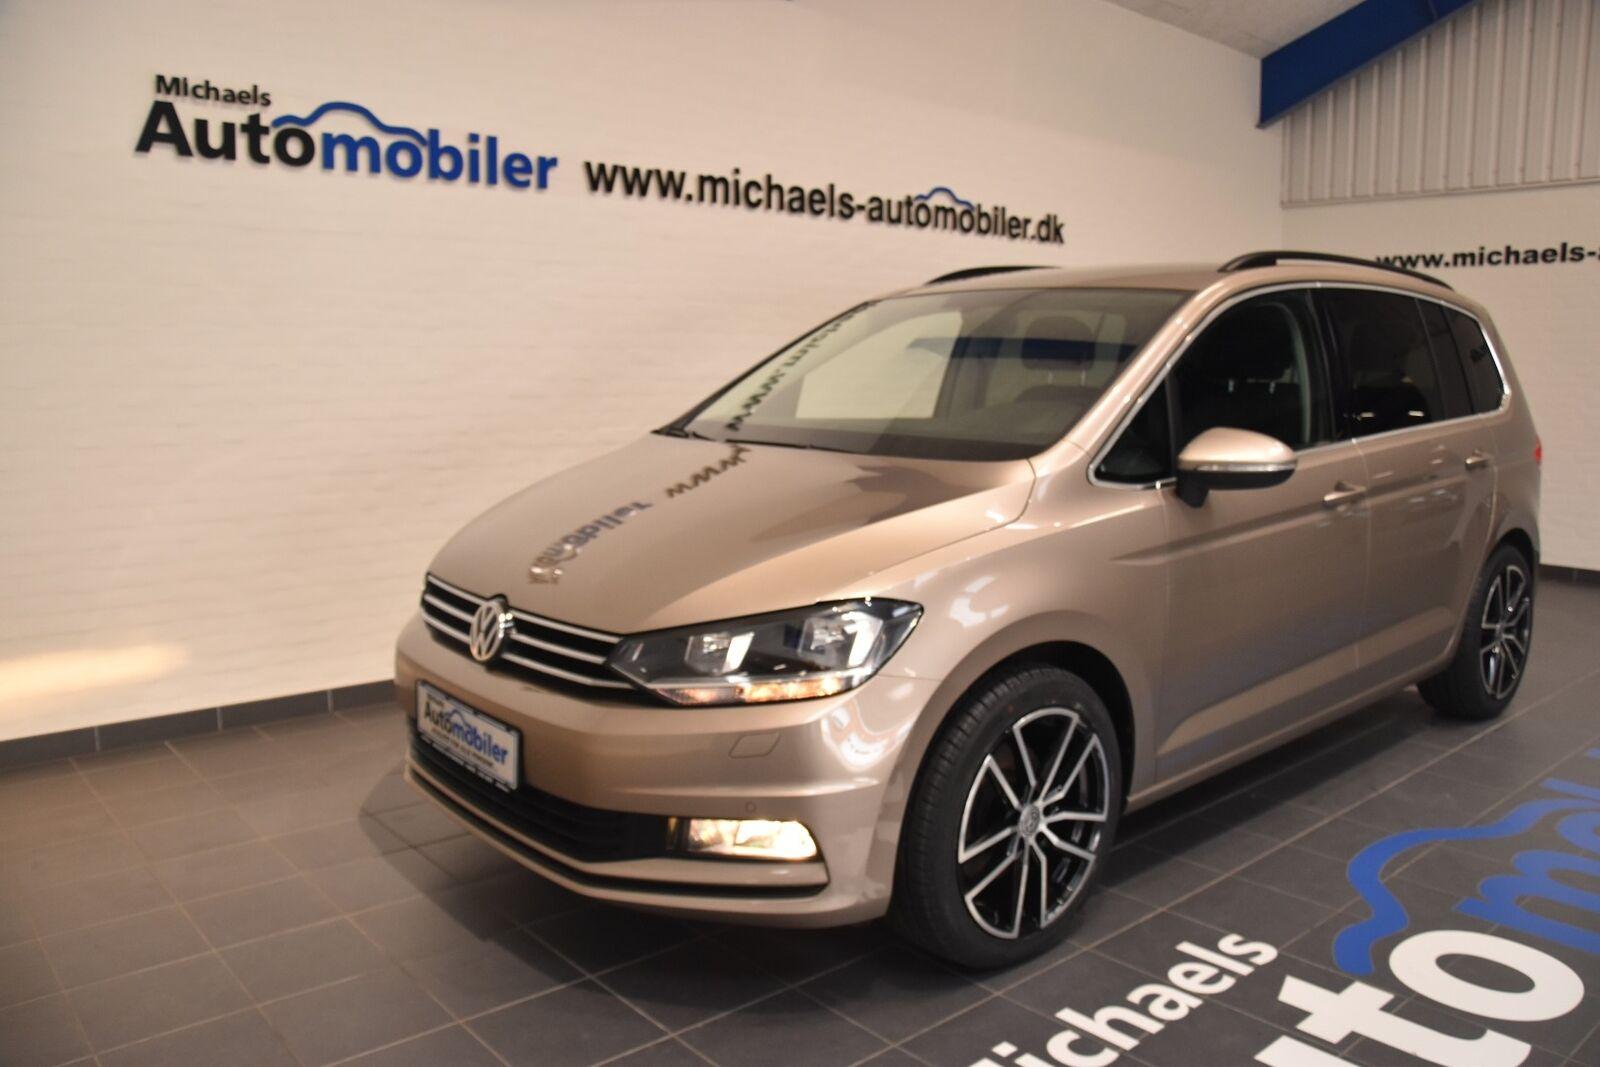 VW Touran 1,4 TSi 150 Comfortline DSG 7prs 5d - 279.900 kr.